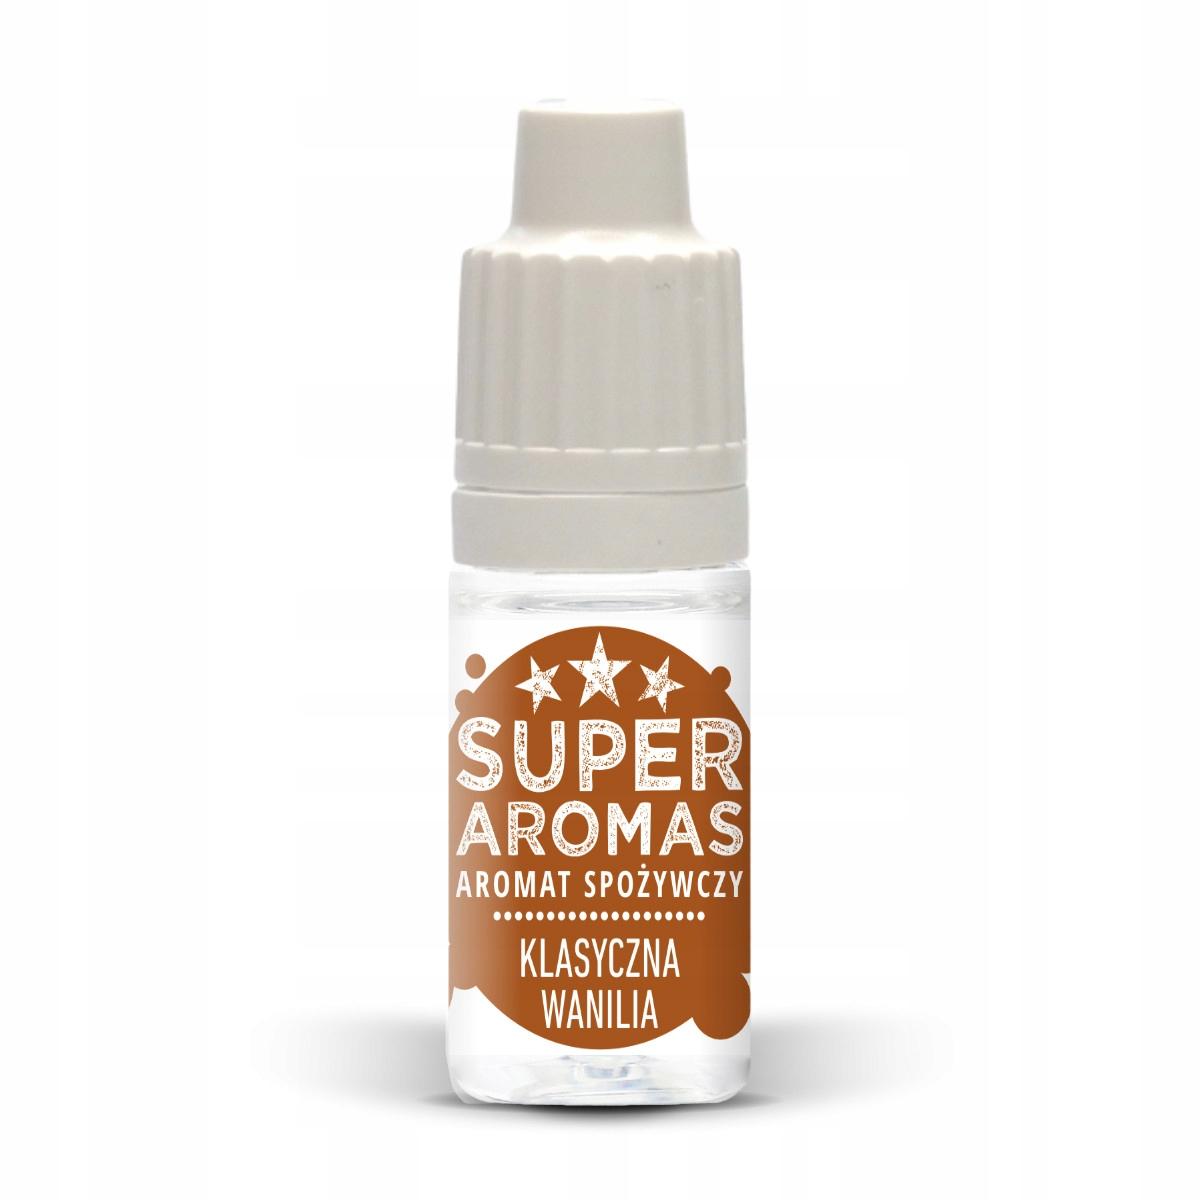 SUPER AROMAS Aromat KLASYCZNA WANILIA 10 ml